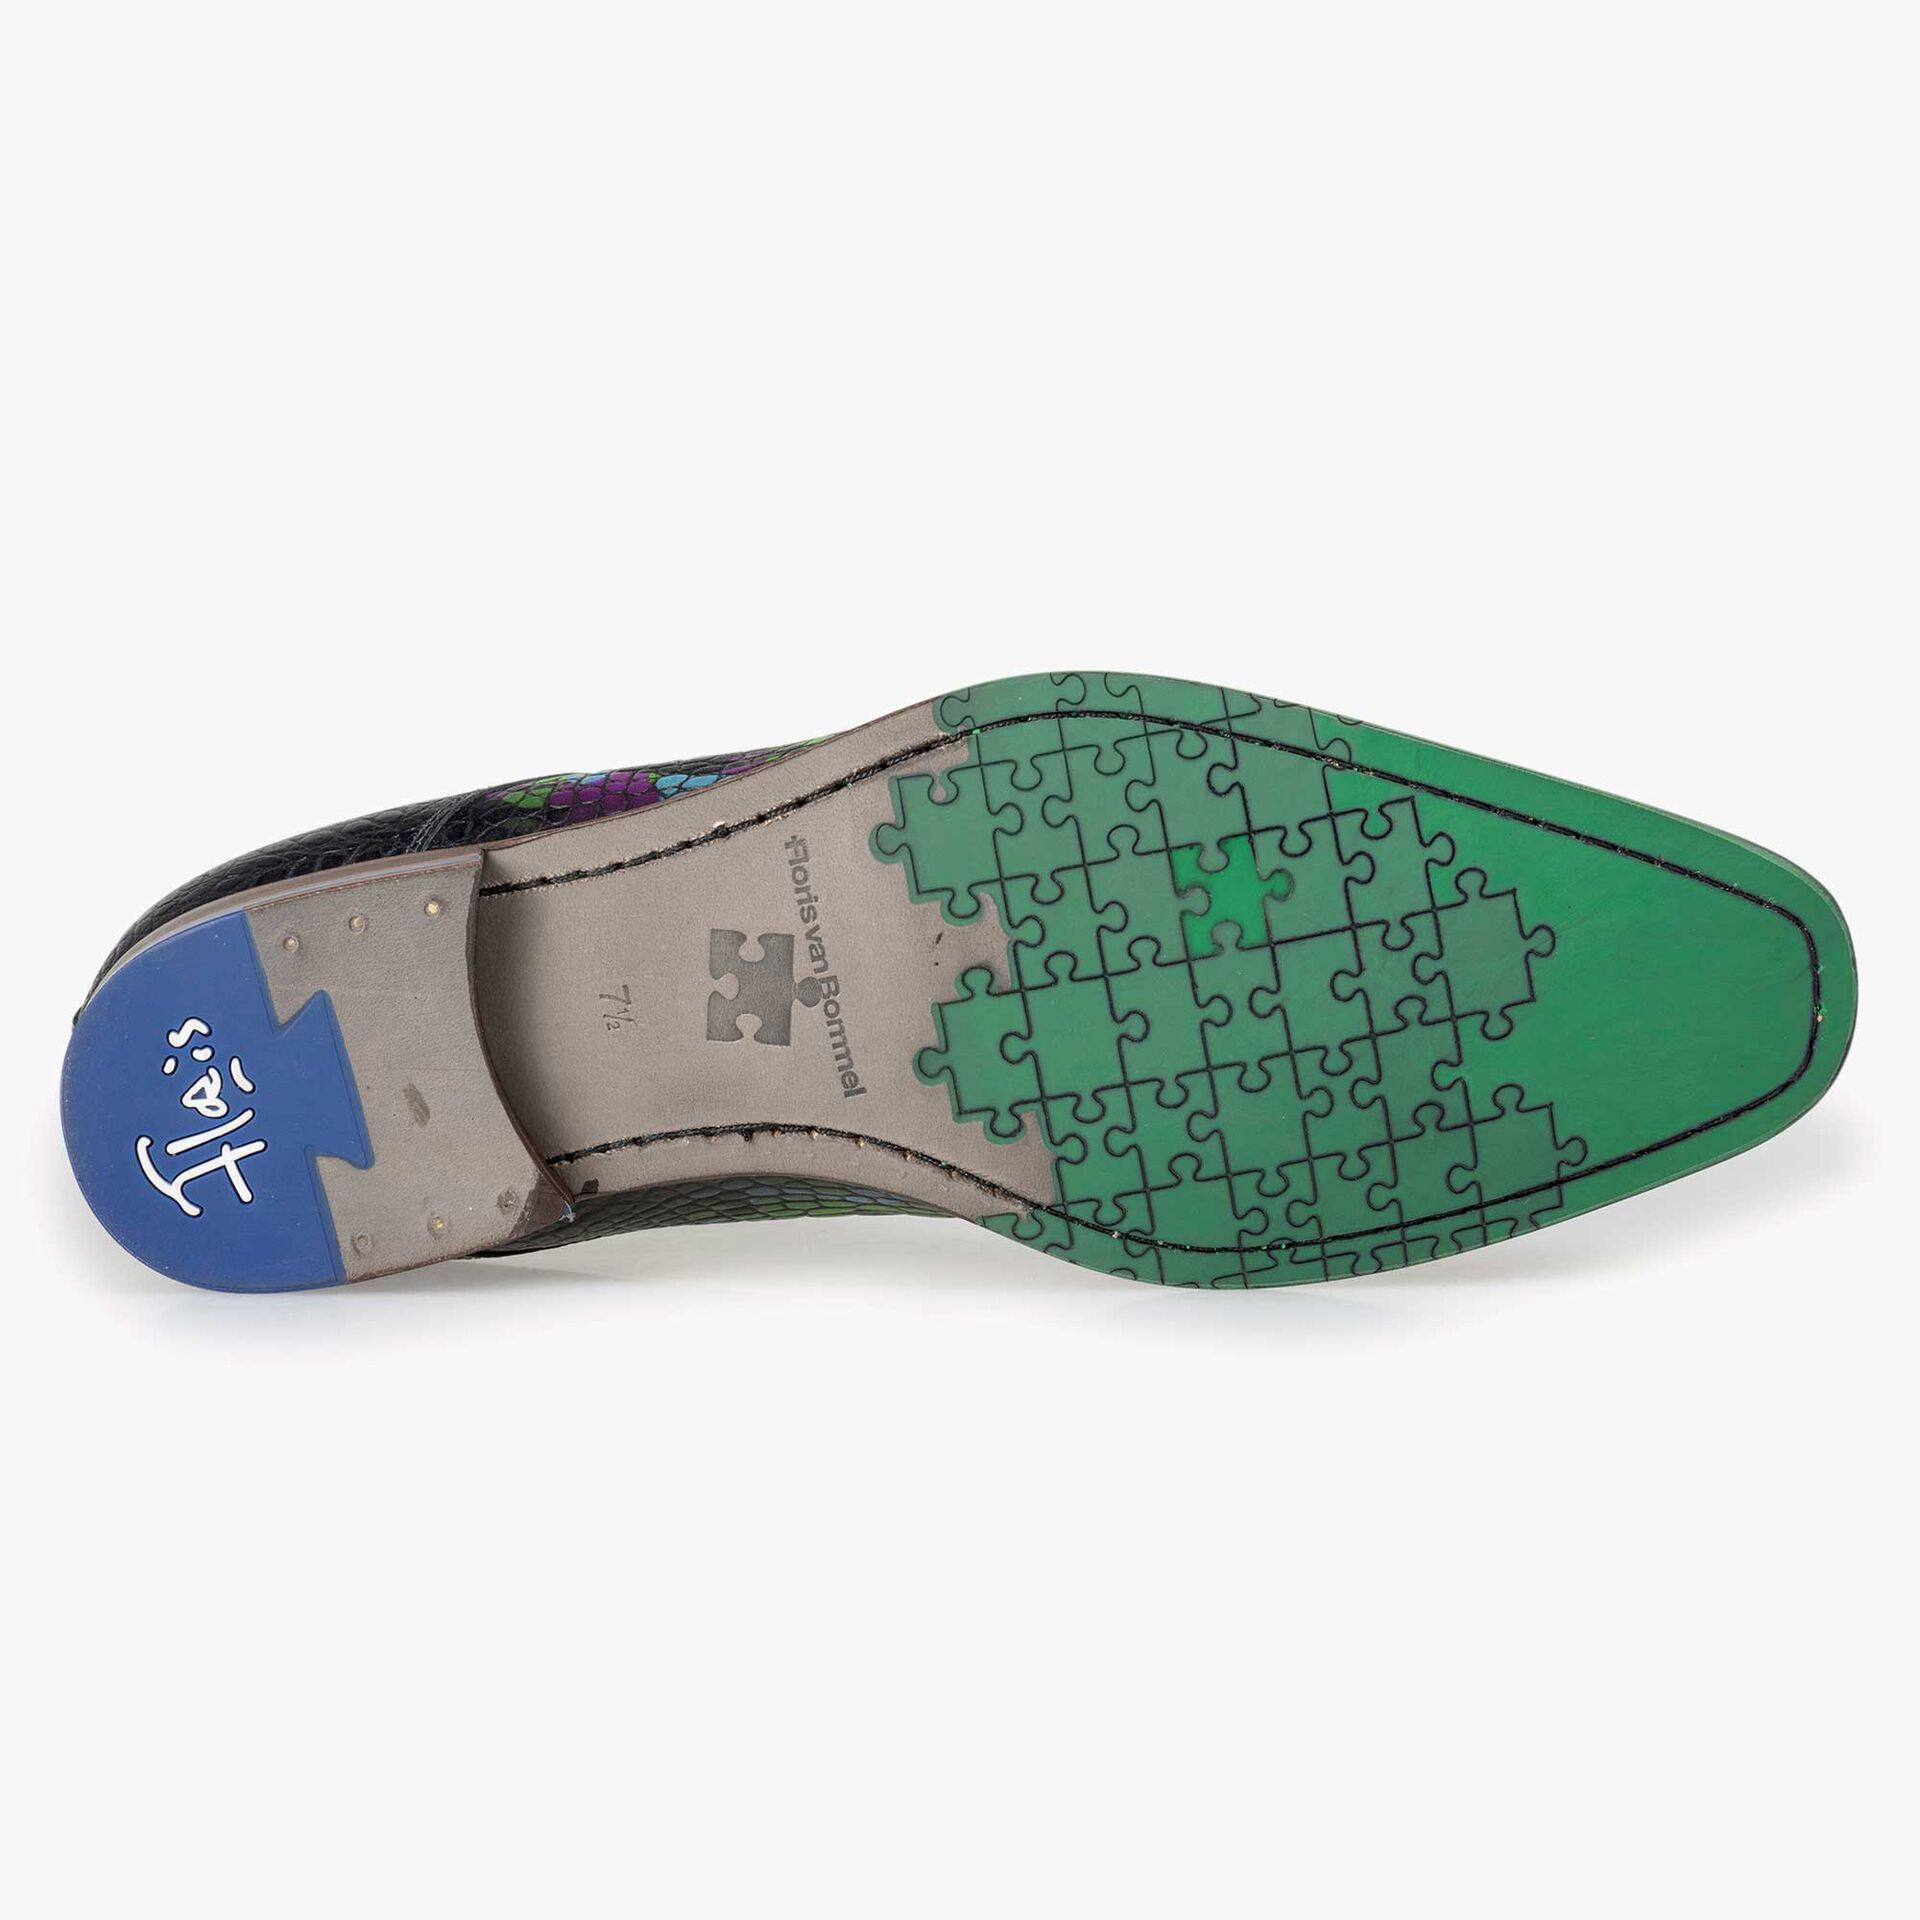 Floris van Bommel Premium men's multi-coloured croco print lace boot